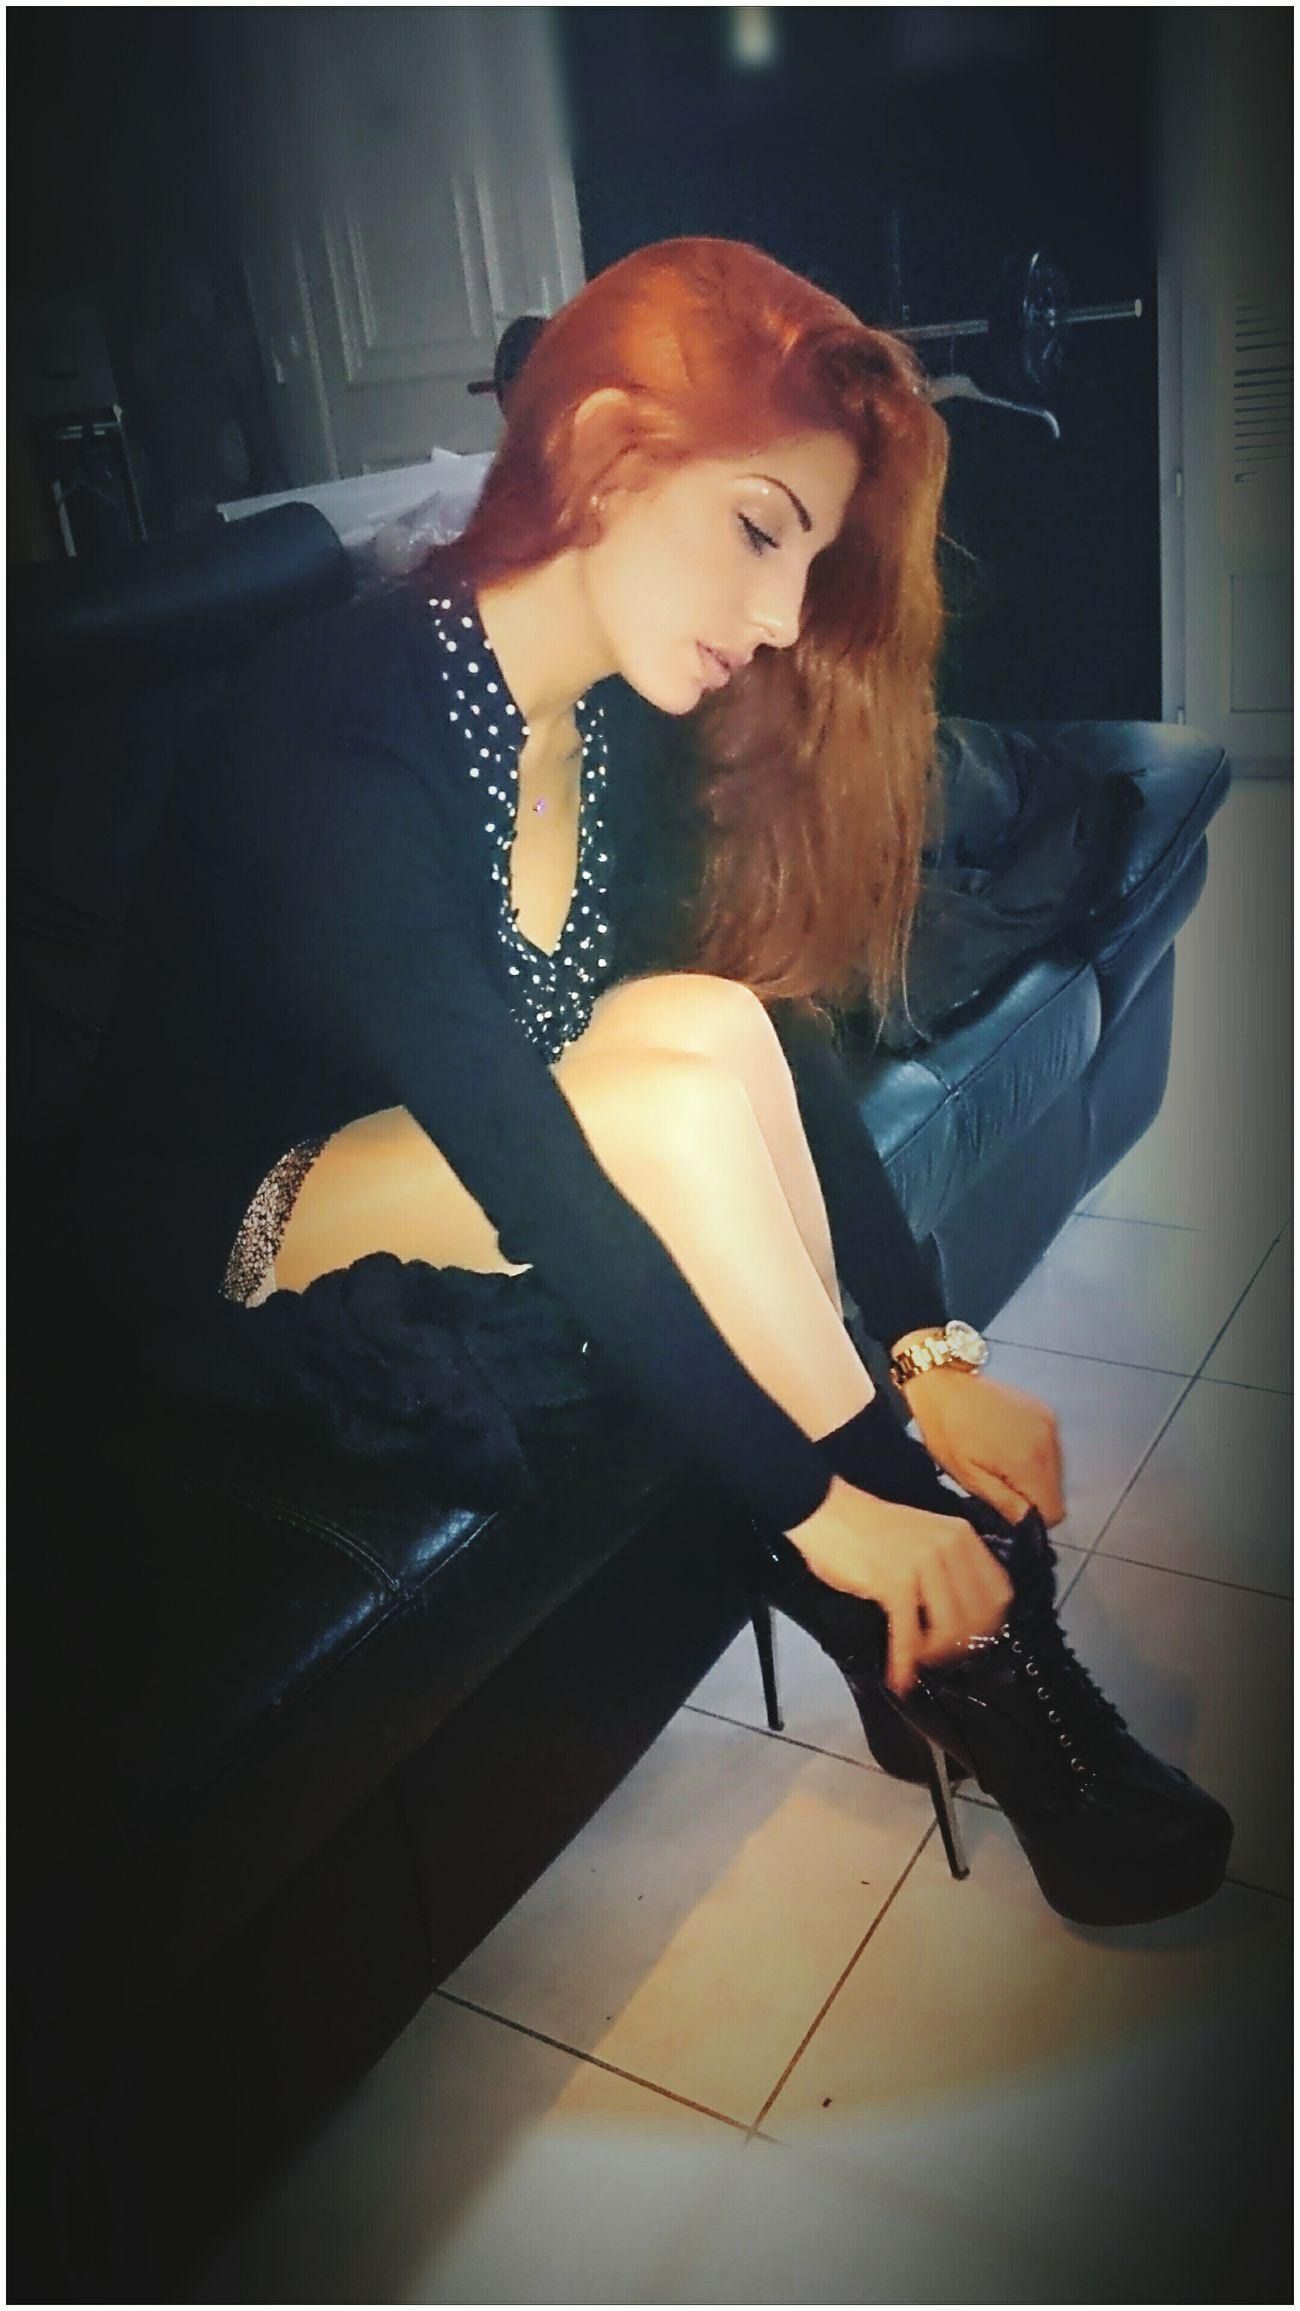 Enjoying Life SWAG ♥ Nice Goodshoes Rousse Its Me Model Shoot Pleaselikeme Woman Justforfun